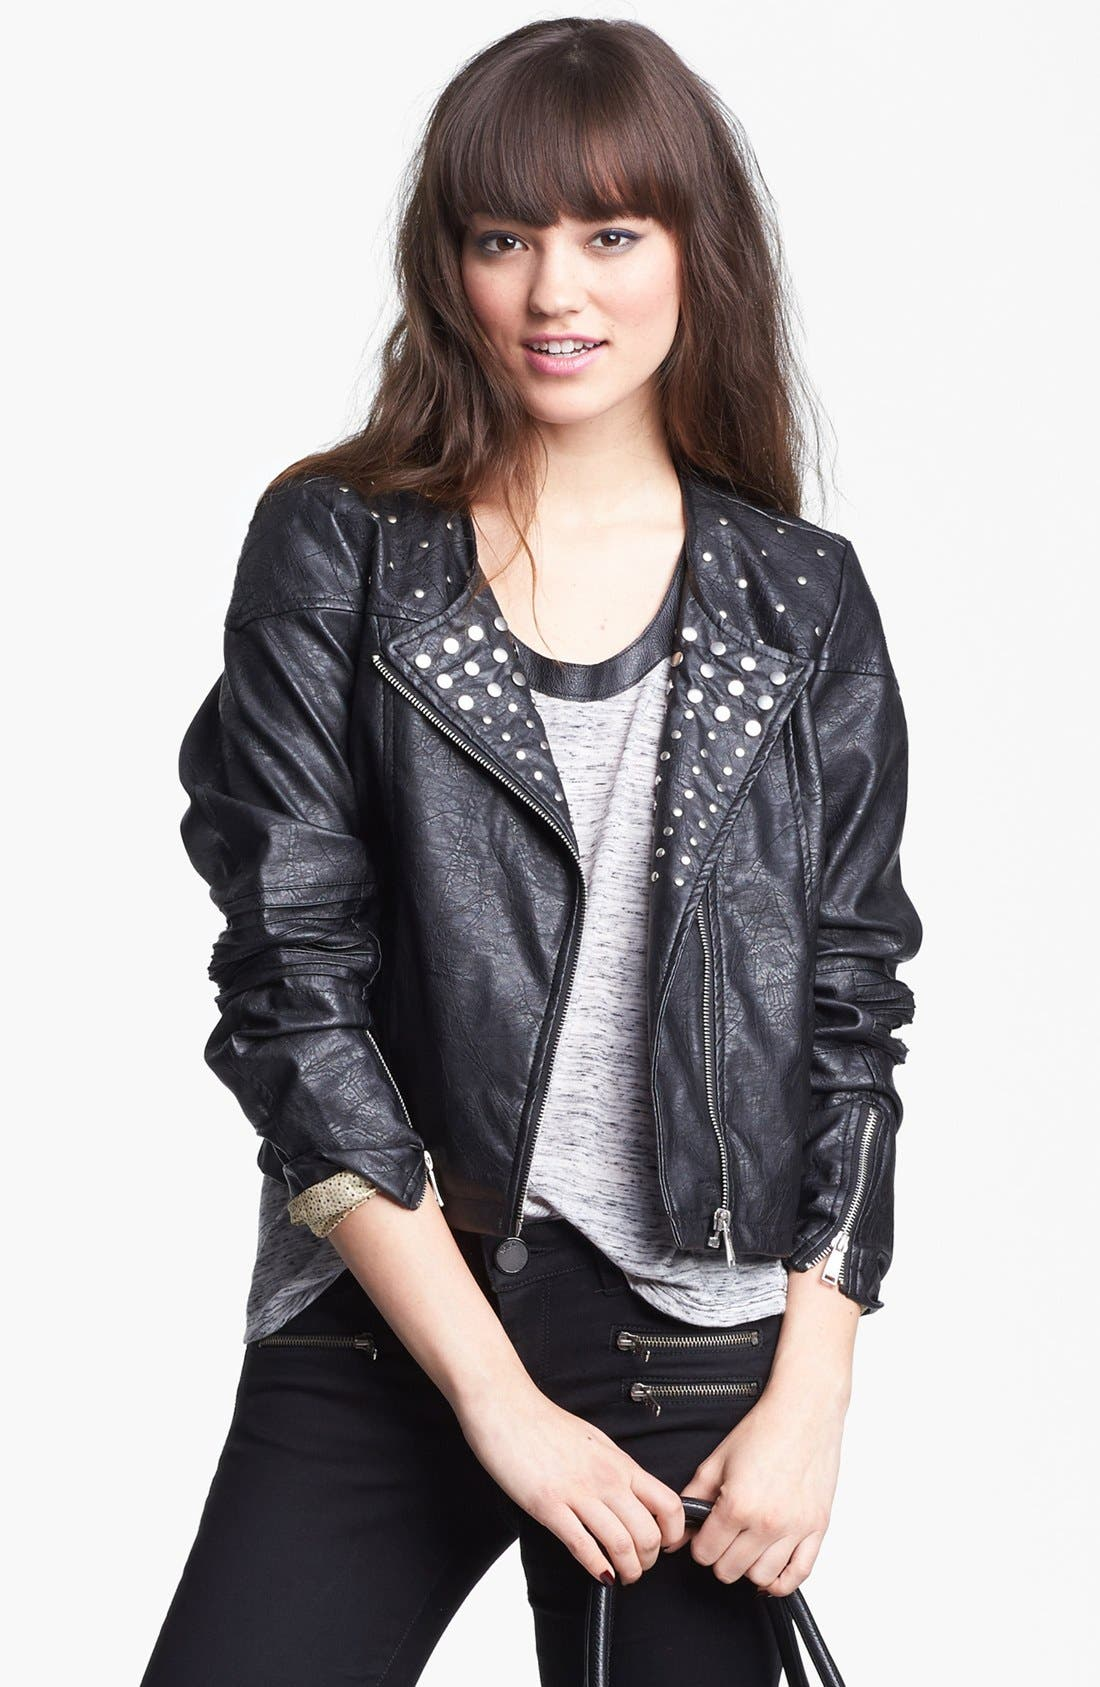 Alternate Image 1 Selected - Jou Jou Studded Faux Leather Crop Moto Jacket (Juniors)